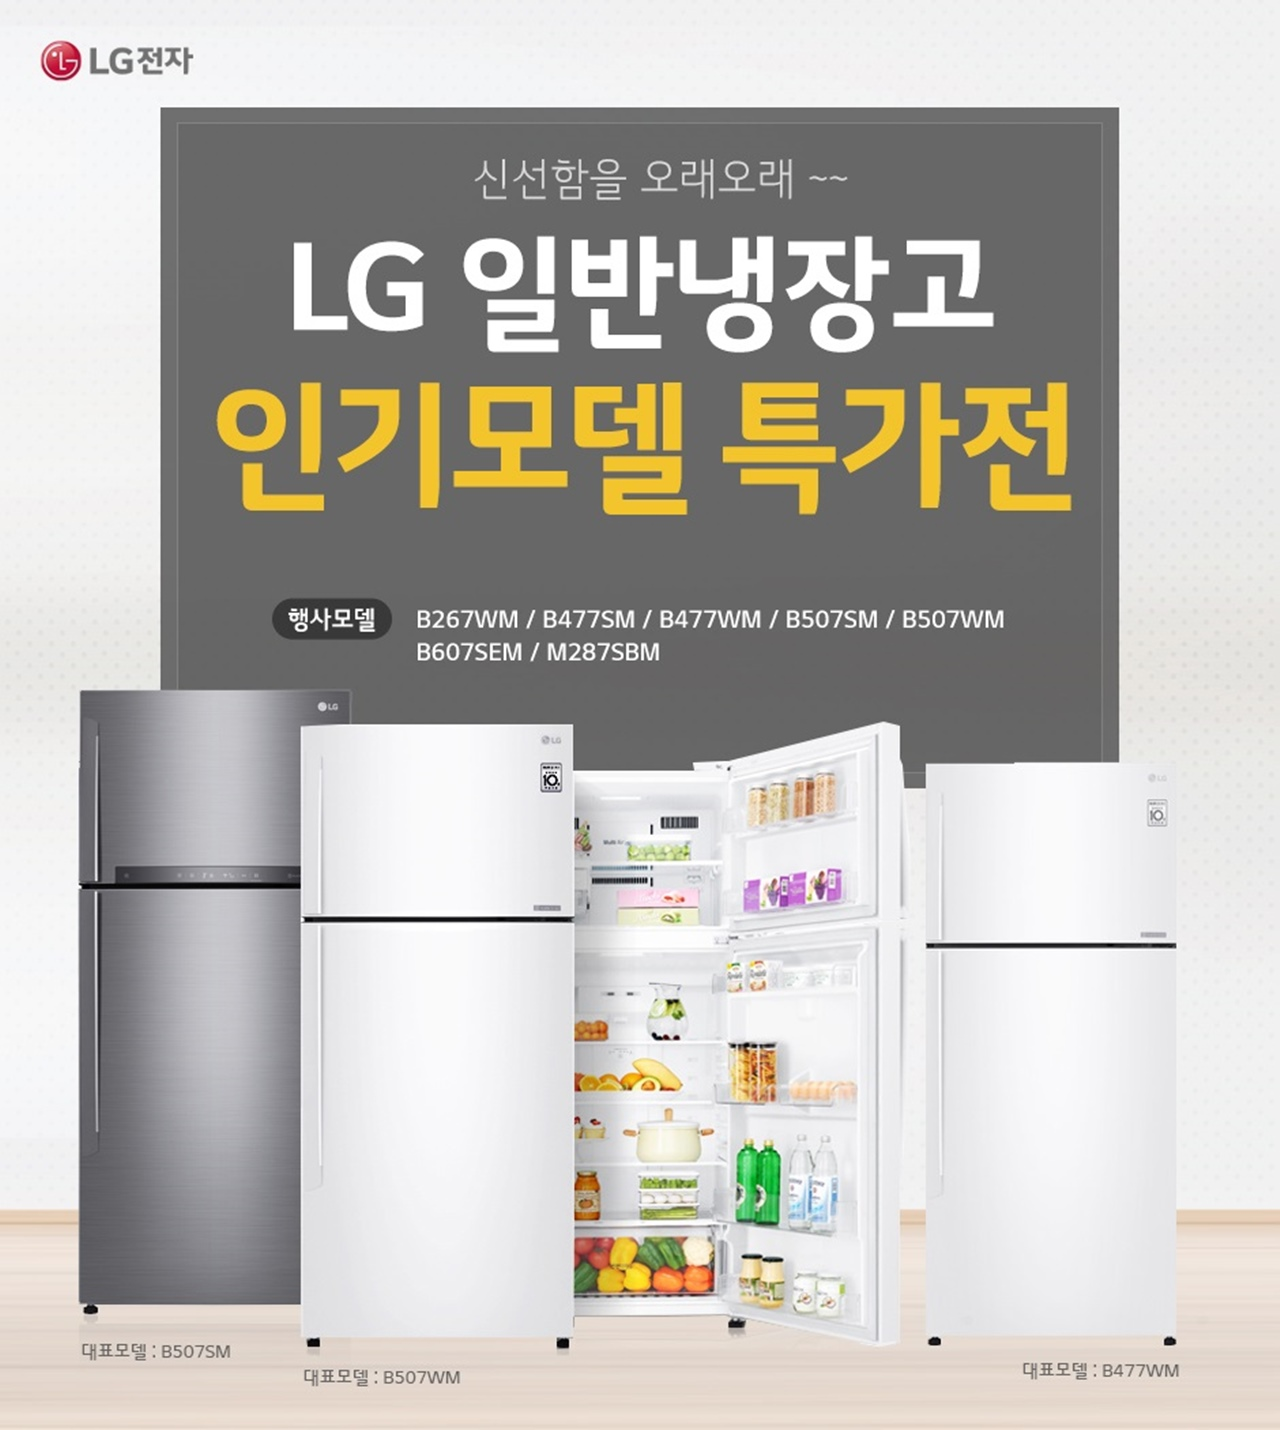 [LG전자] LG 일반냉장고 인기 모델 모음전 신선함도! 깔끔함도! OK!